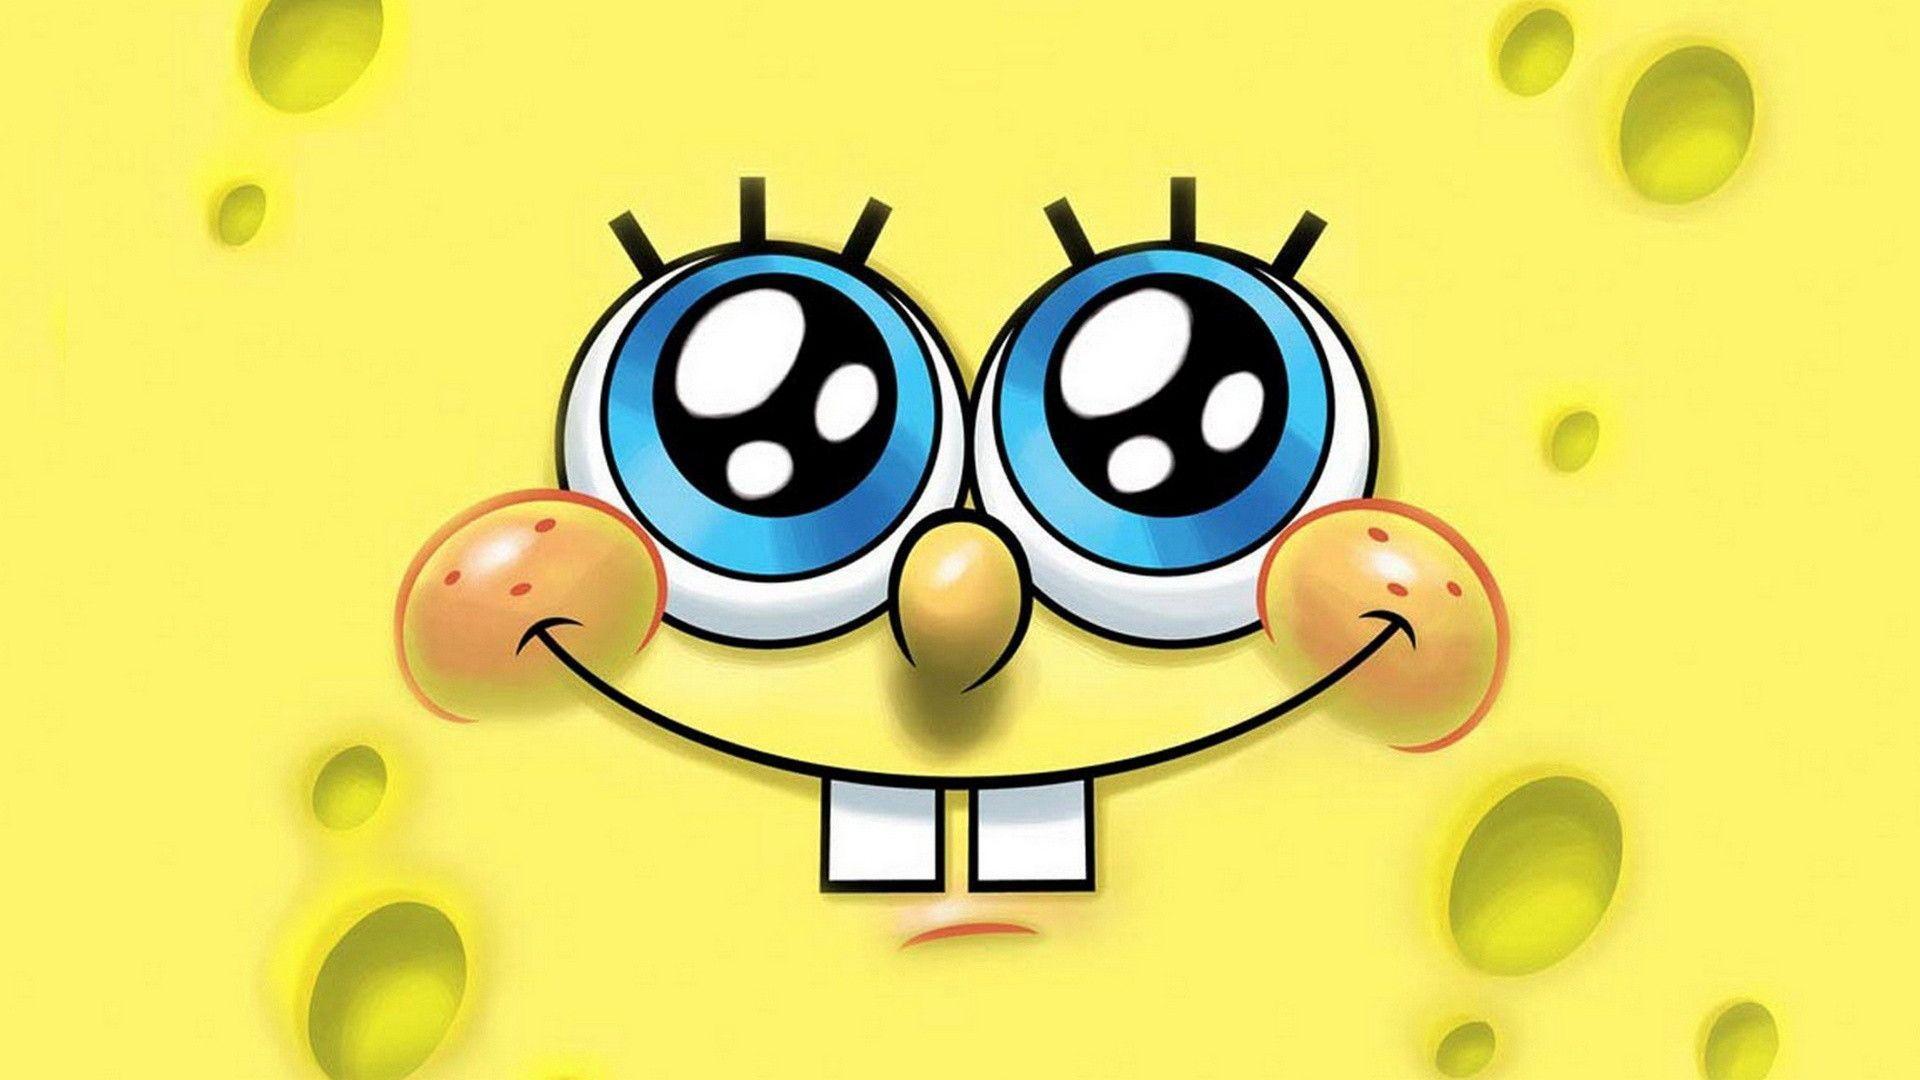 Spongebob Squarepants Zoom Background 6